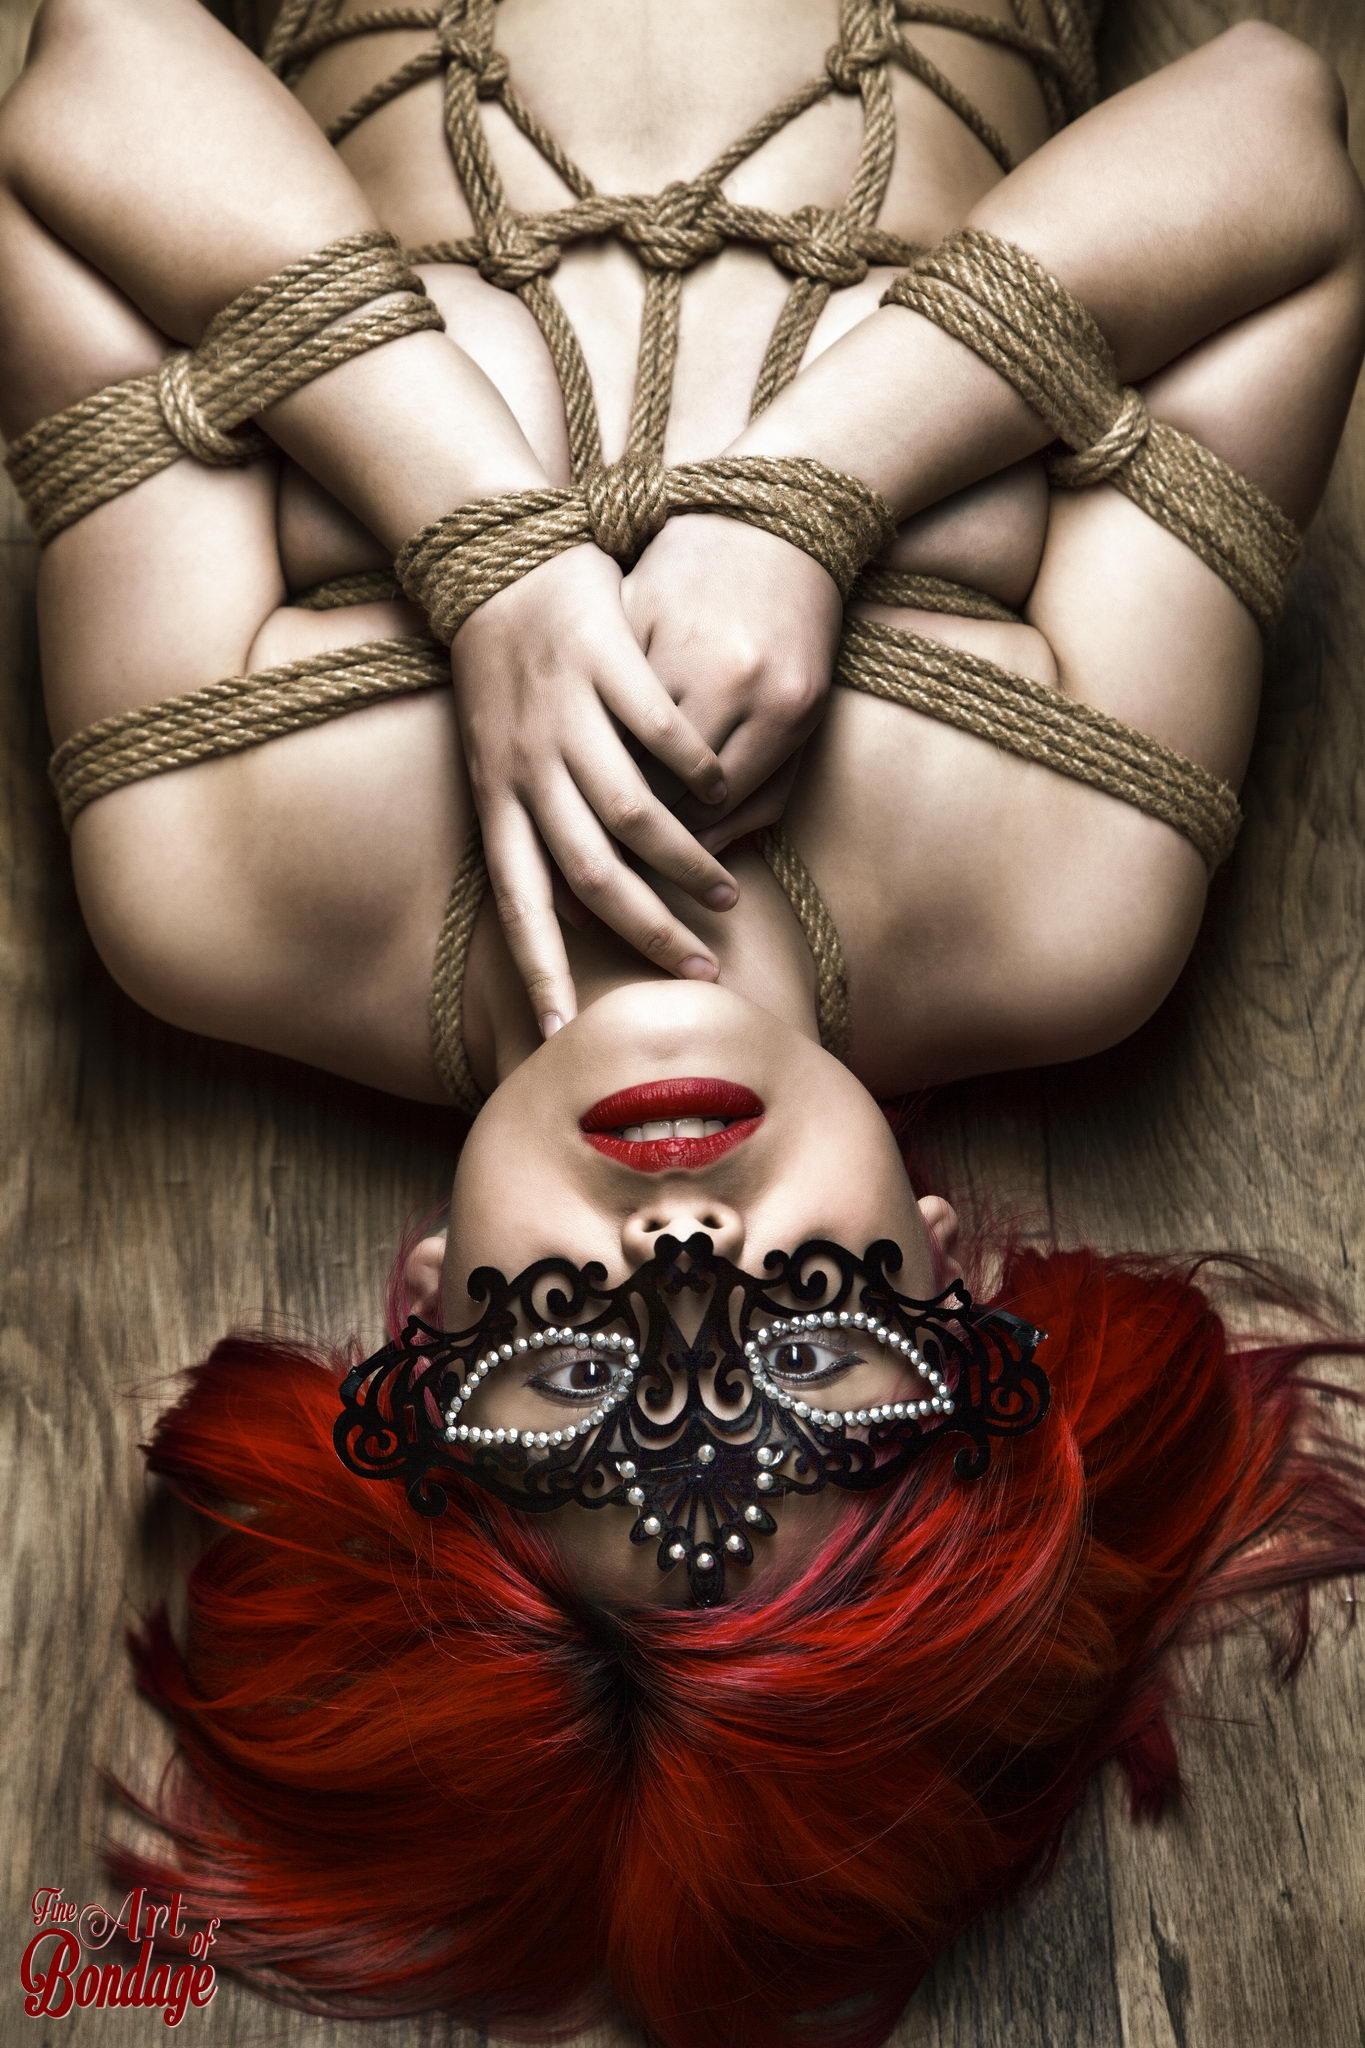 2013 - Tied redhead on floor